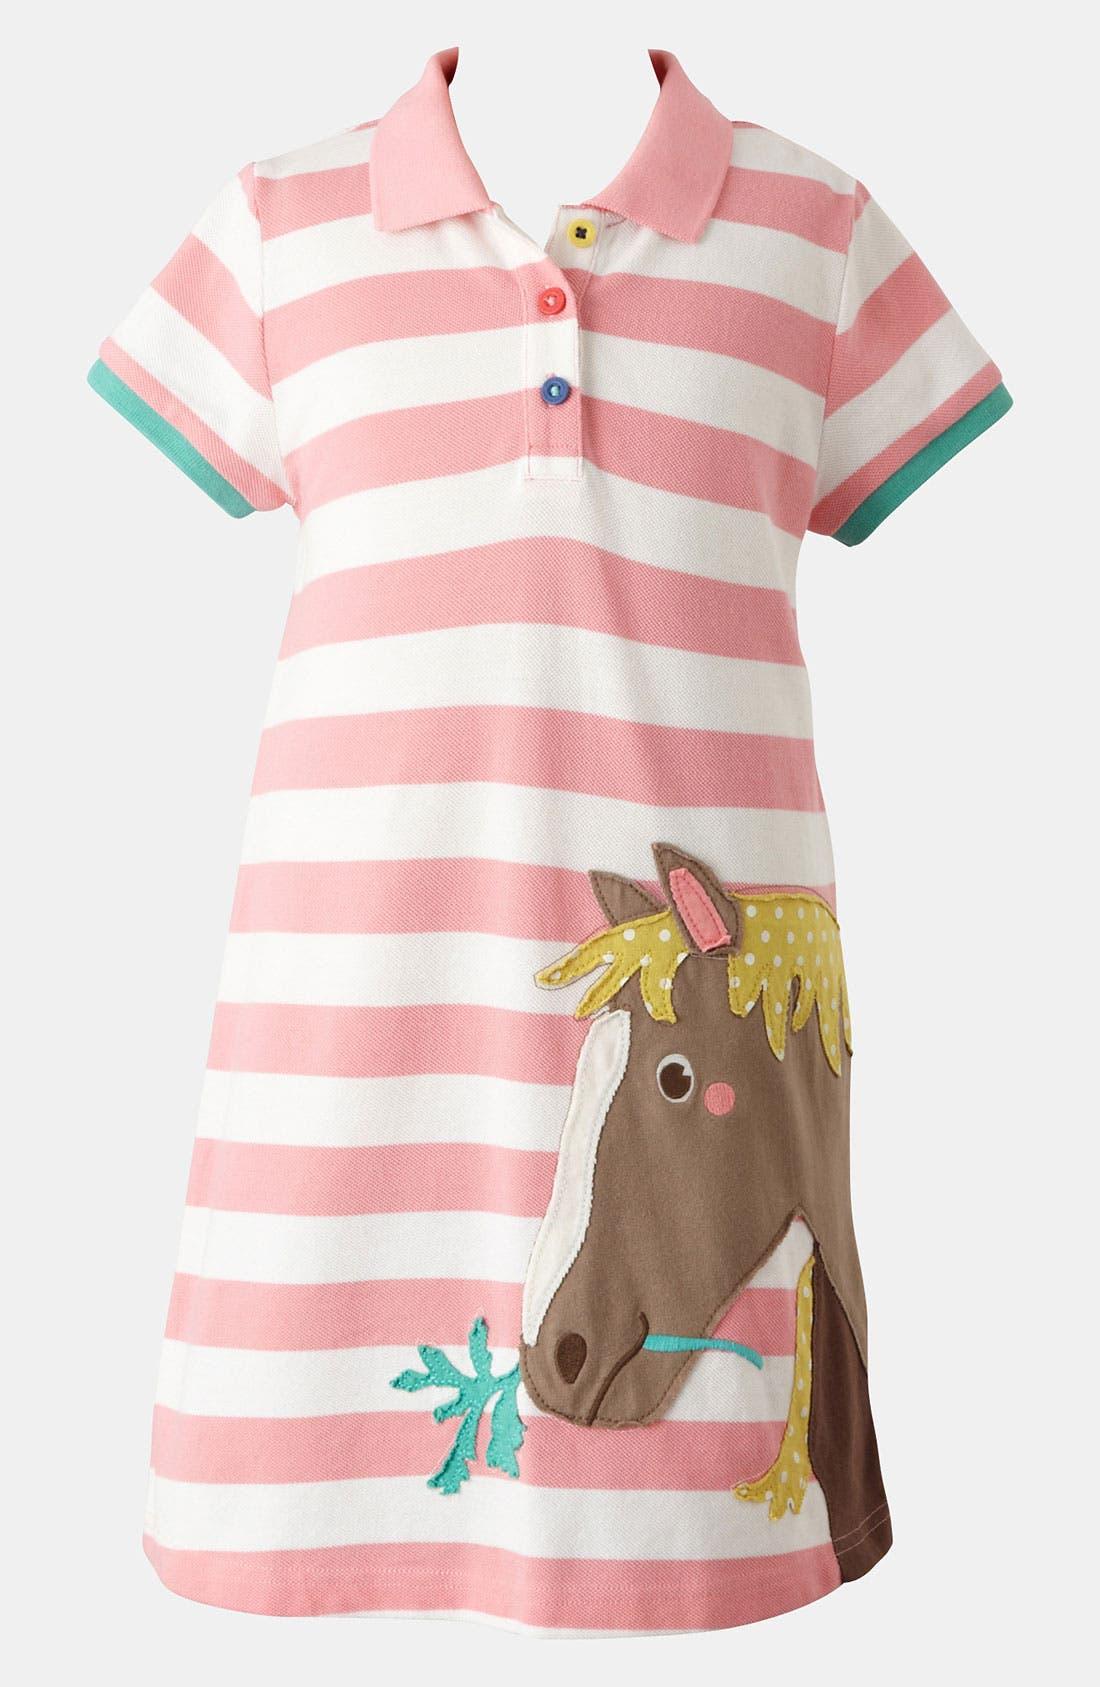 Main Image - Mini Boden 'Fun' Appliqué Polo Dress (Toddler, Little Girls & Big Girls)